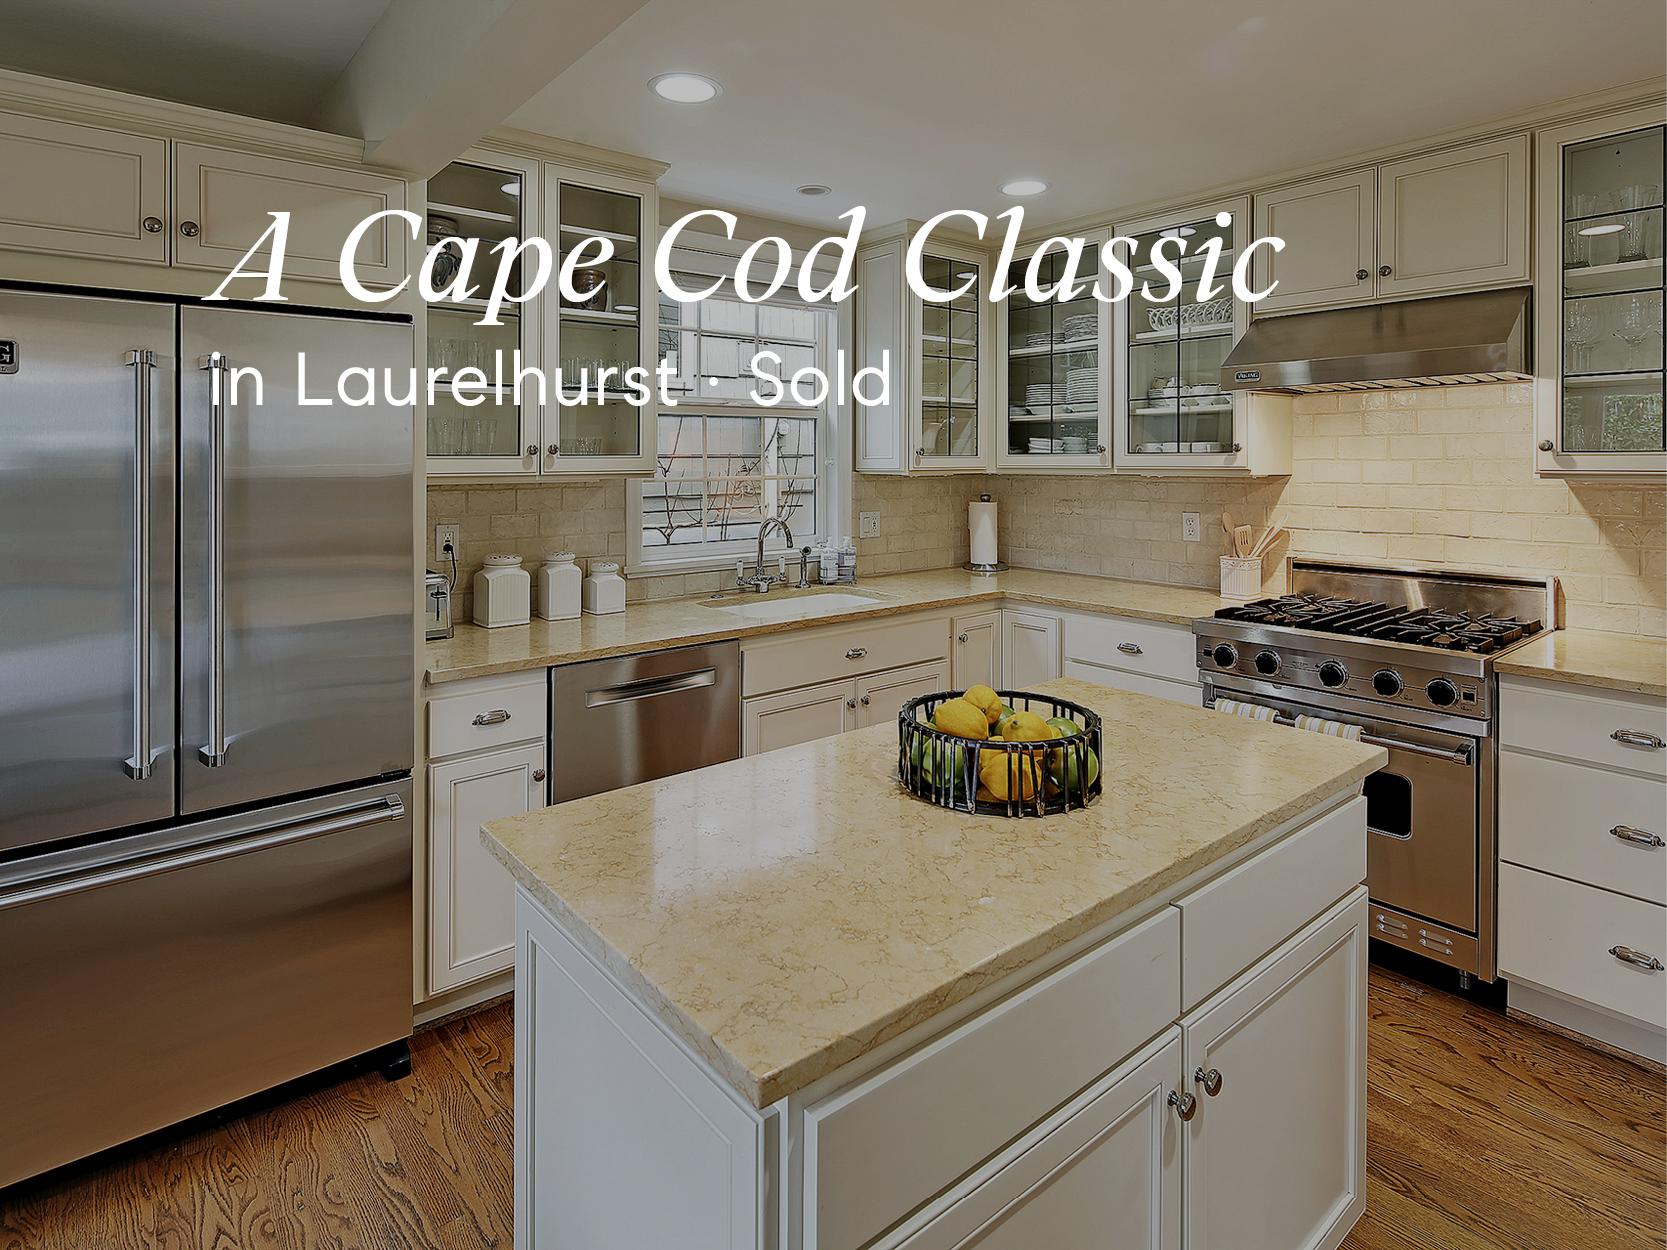 Saffel-Featured-Listings-Laurelhurst-Real-Estate.jpg